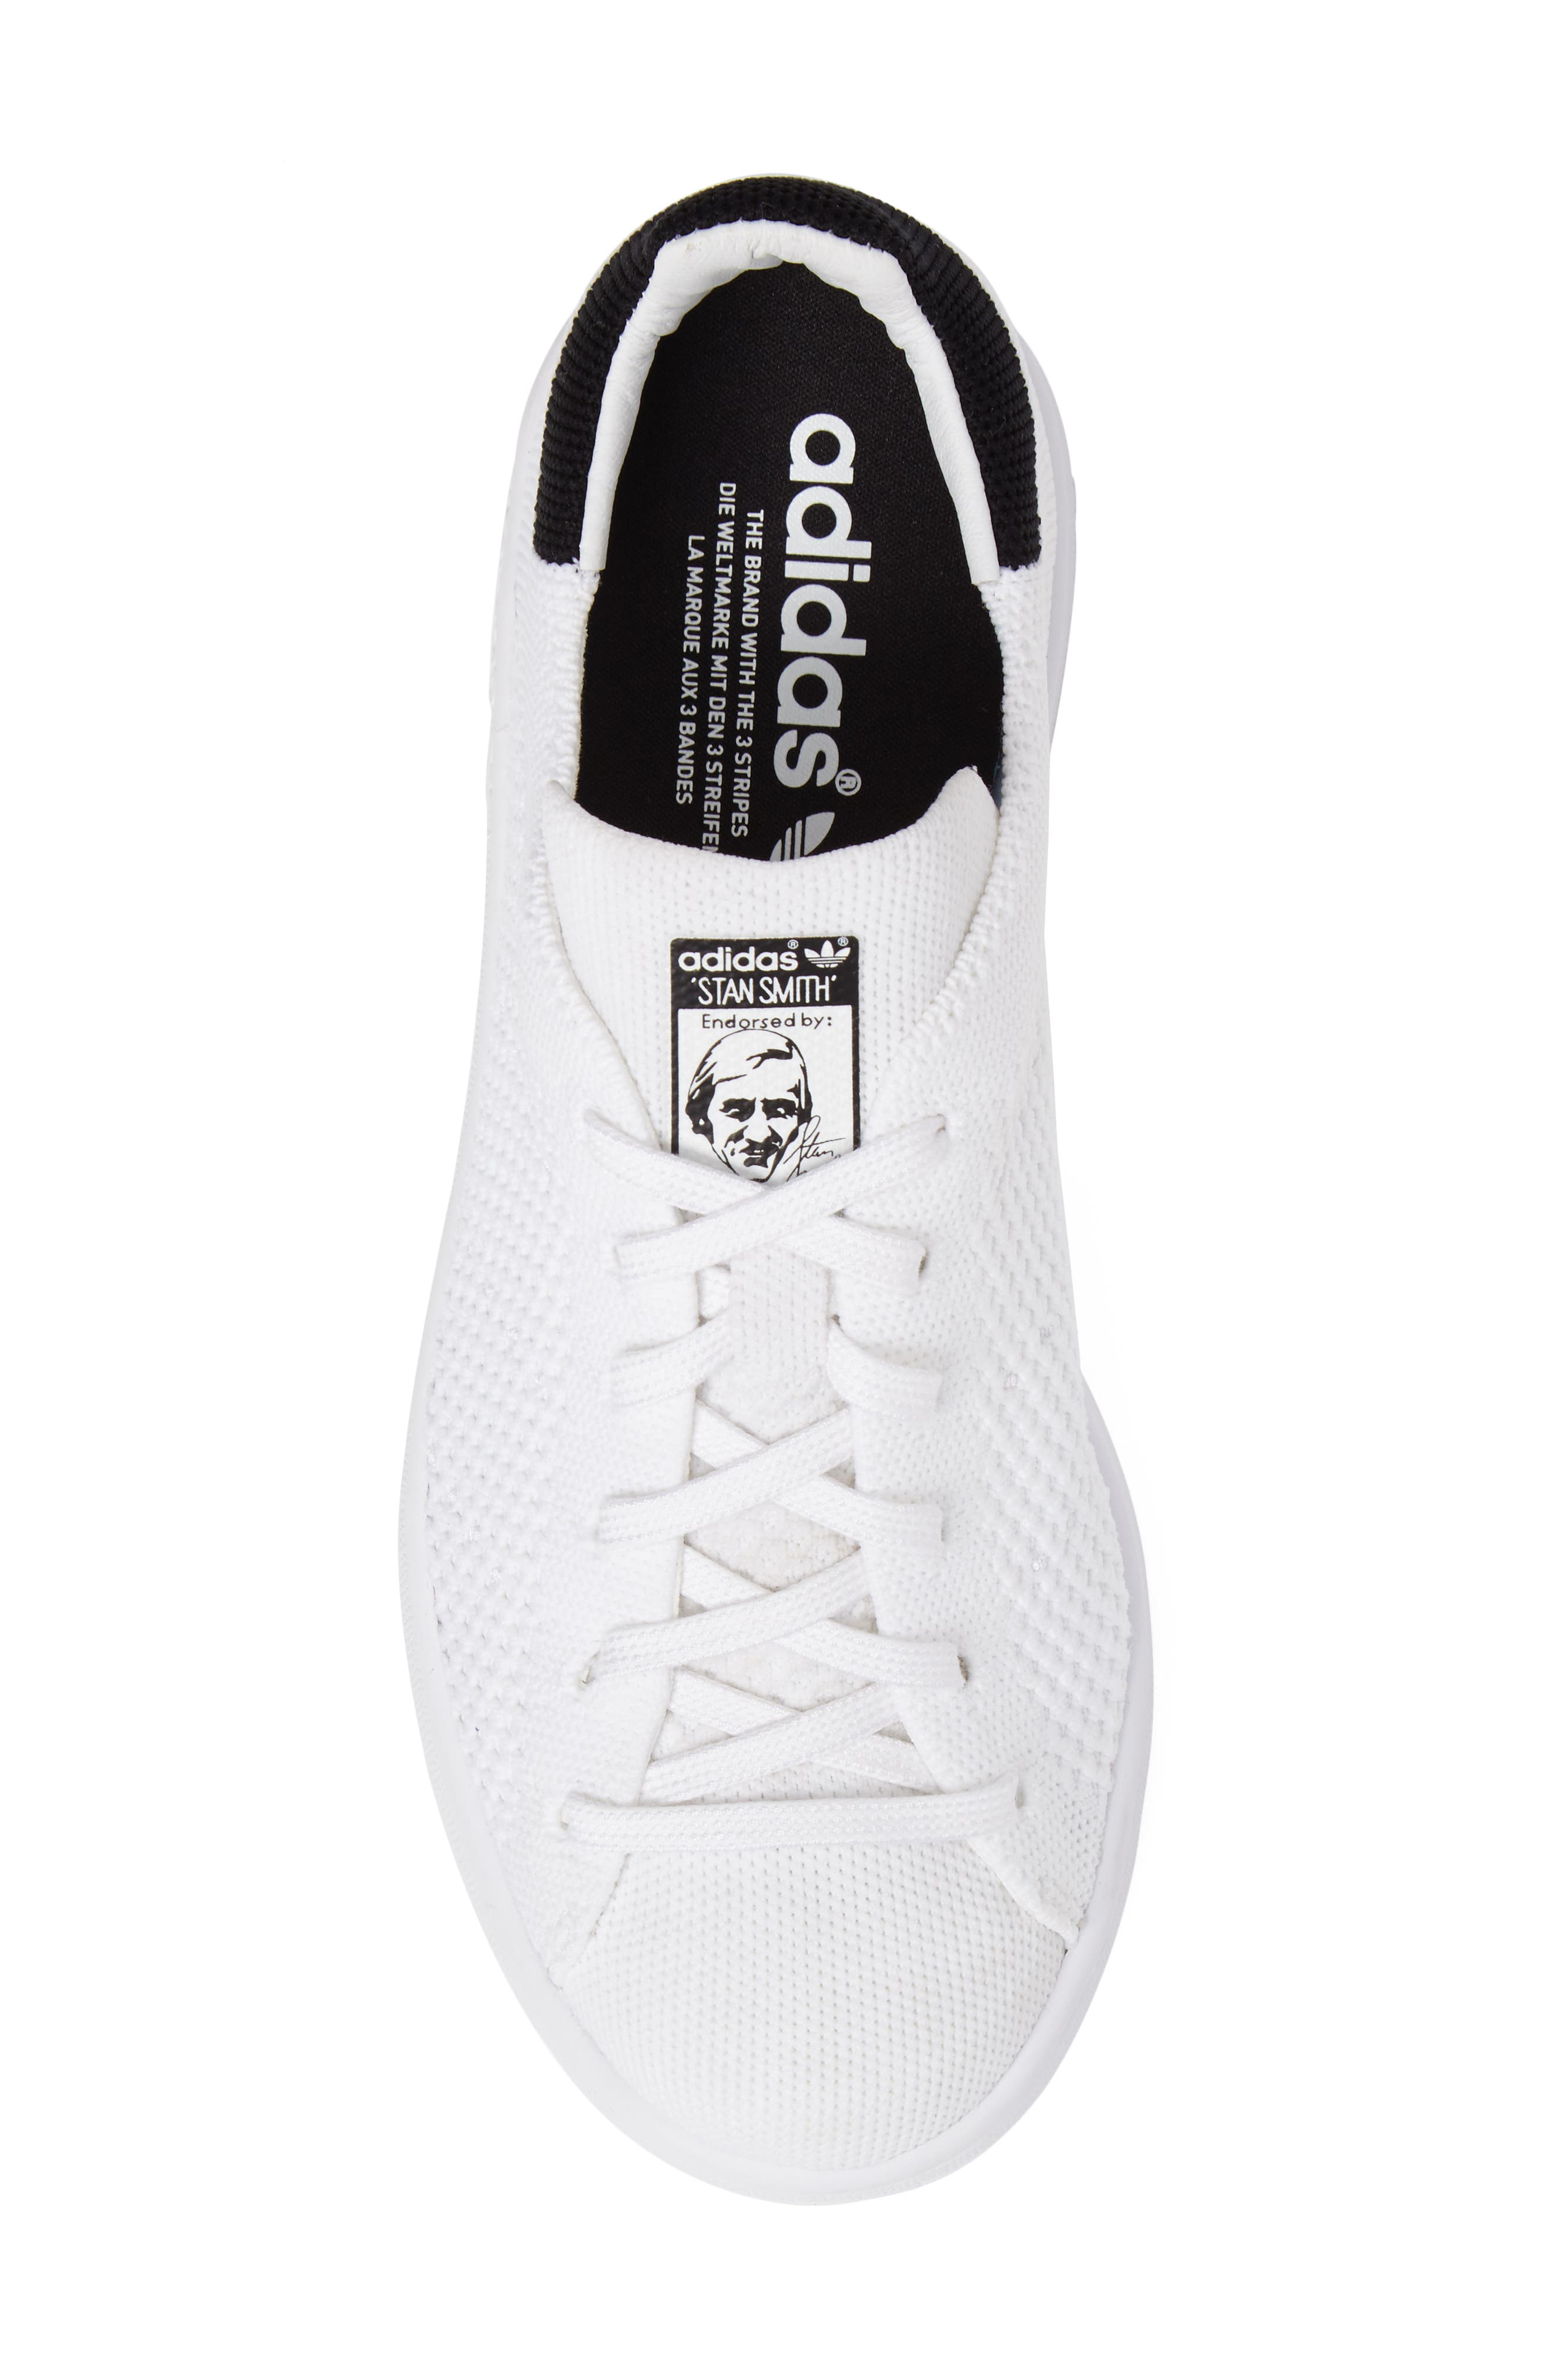 Stan Smith Primeknit Sneaker,                             Alternate thumbnail 5, color,                             Footwear White